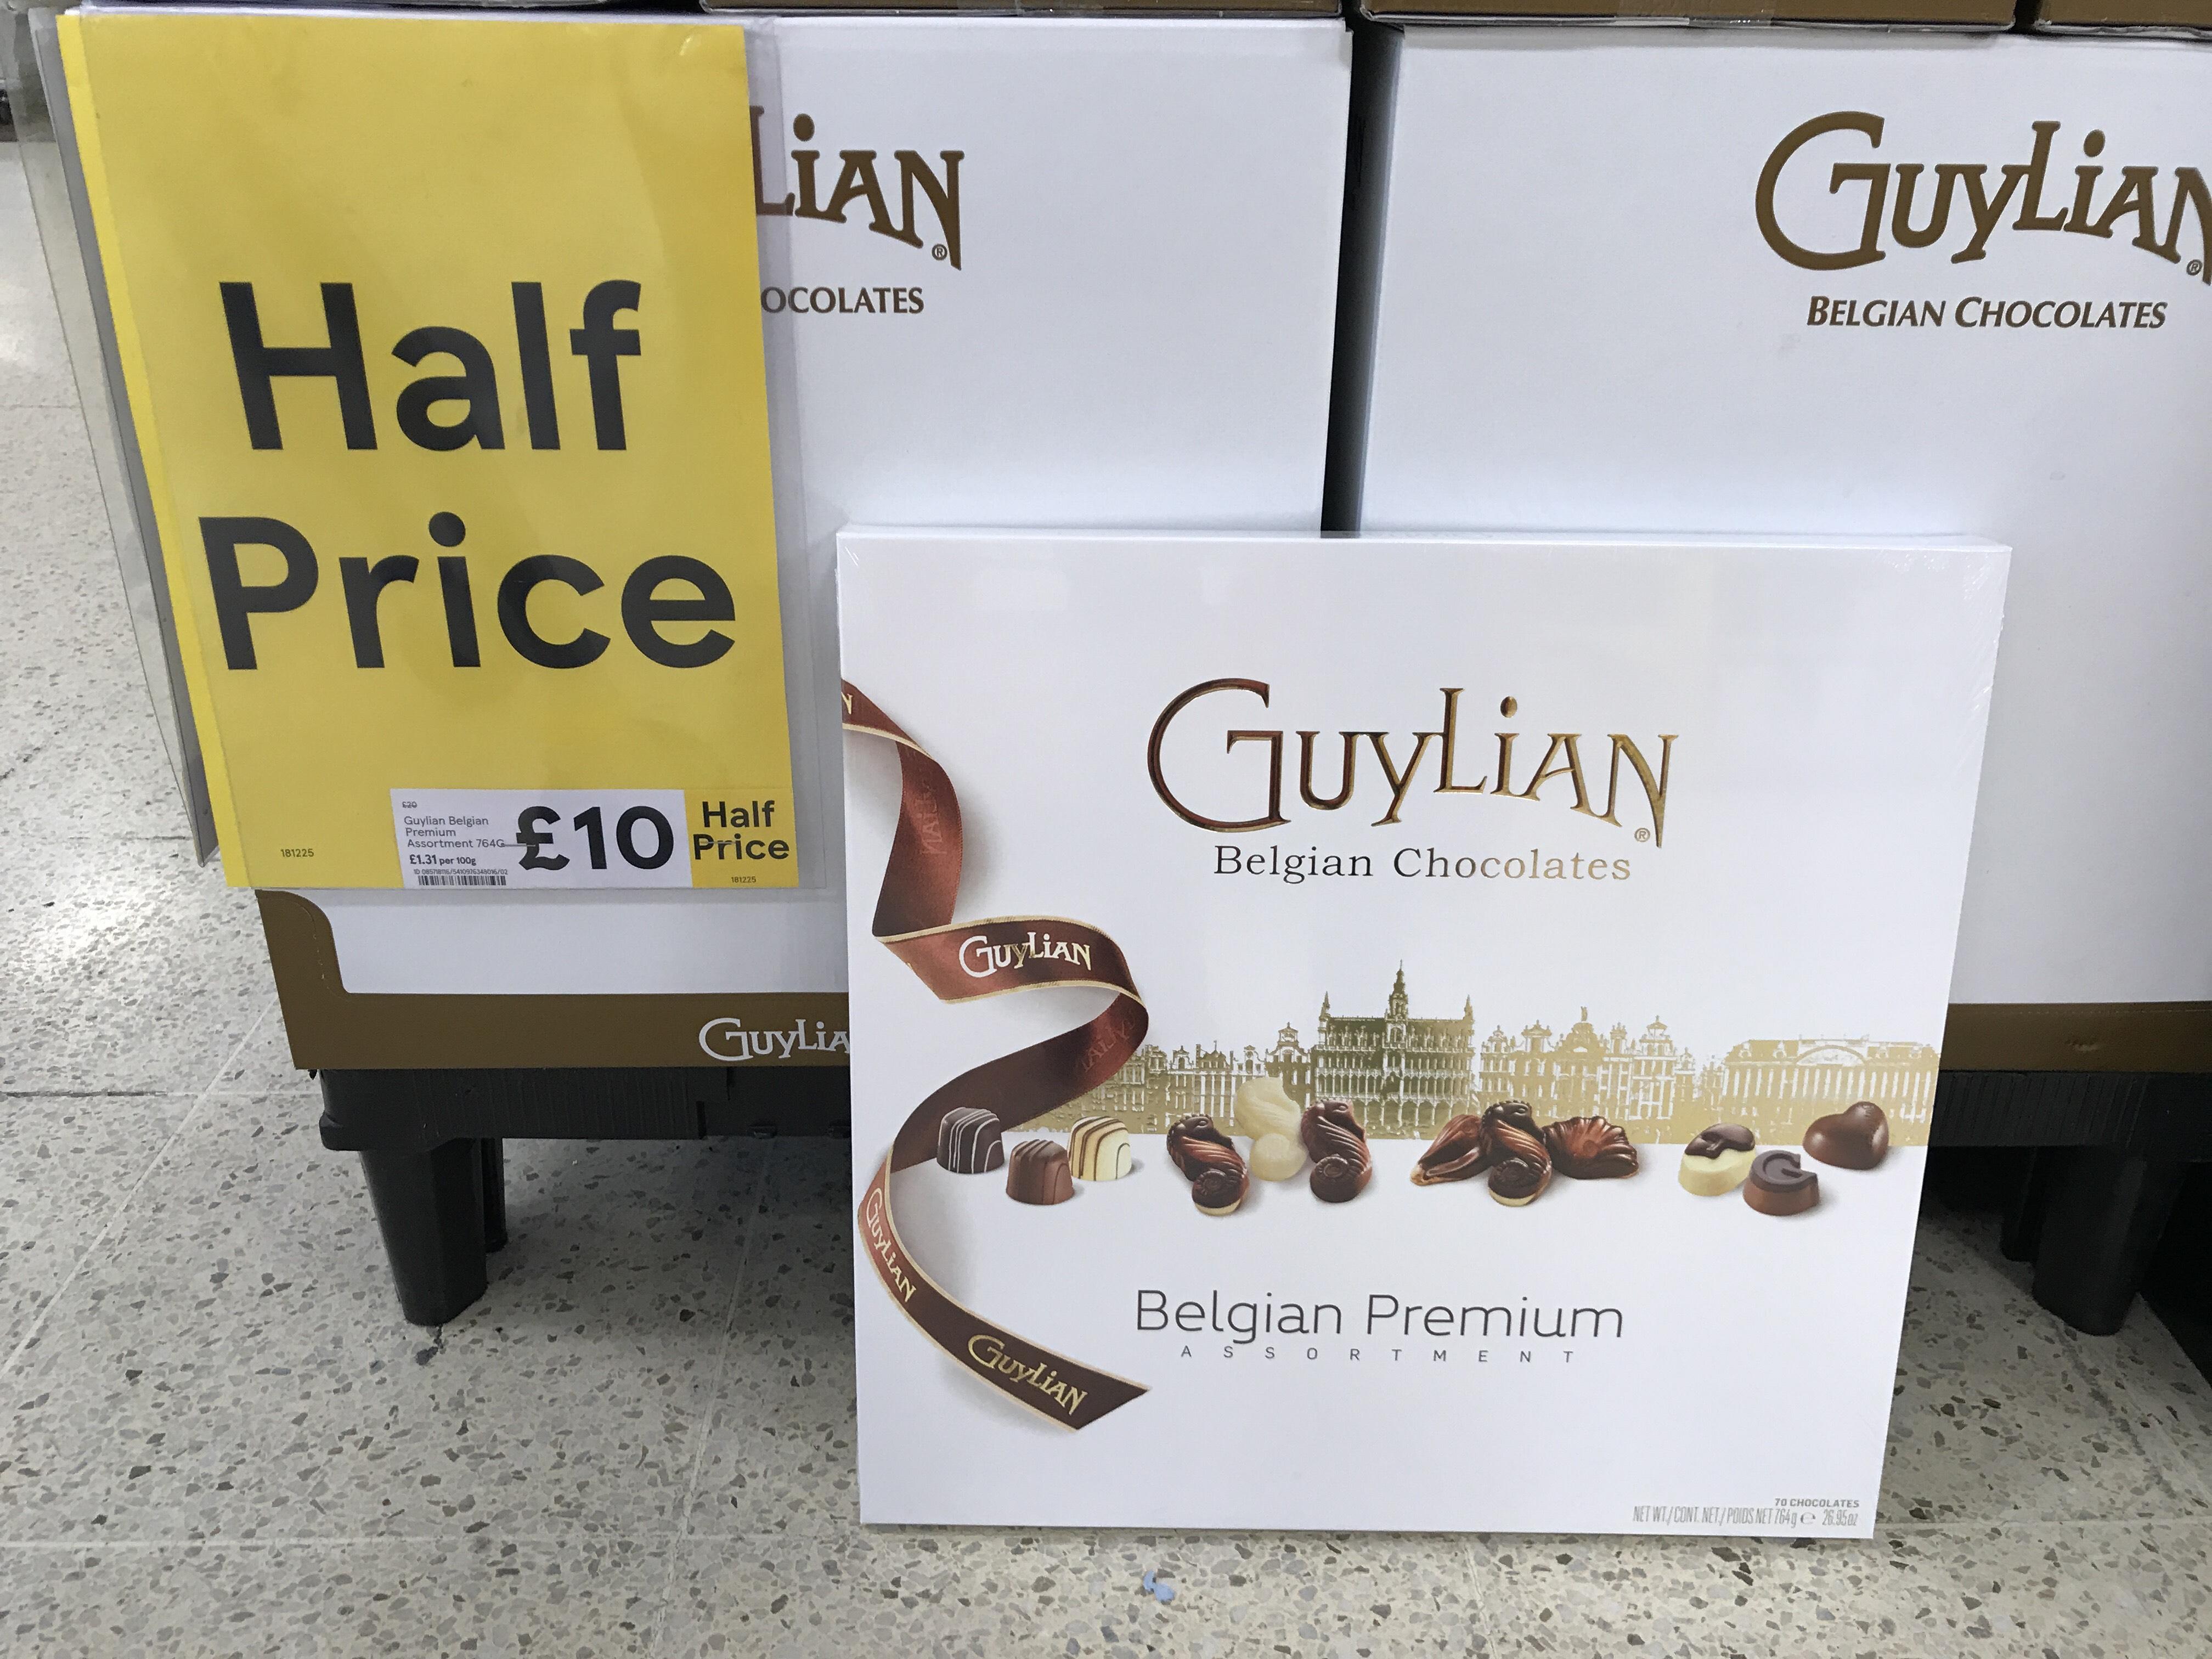 Half Price Guylian Belgian Premium Assortment Chocolates 764g Big Box £10 @ Tesco instores